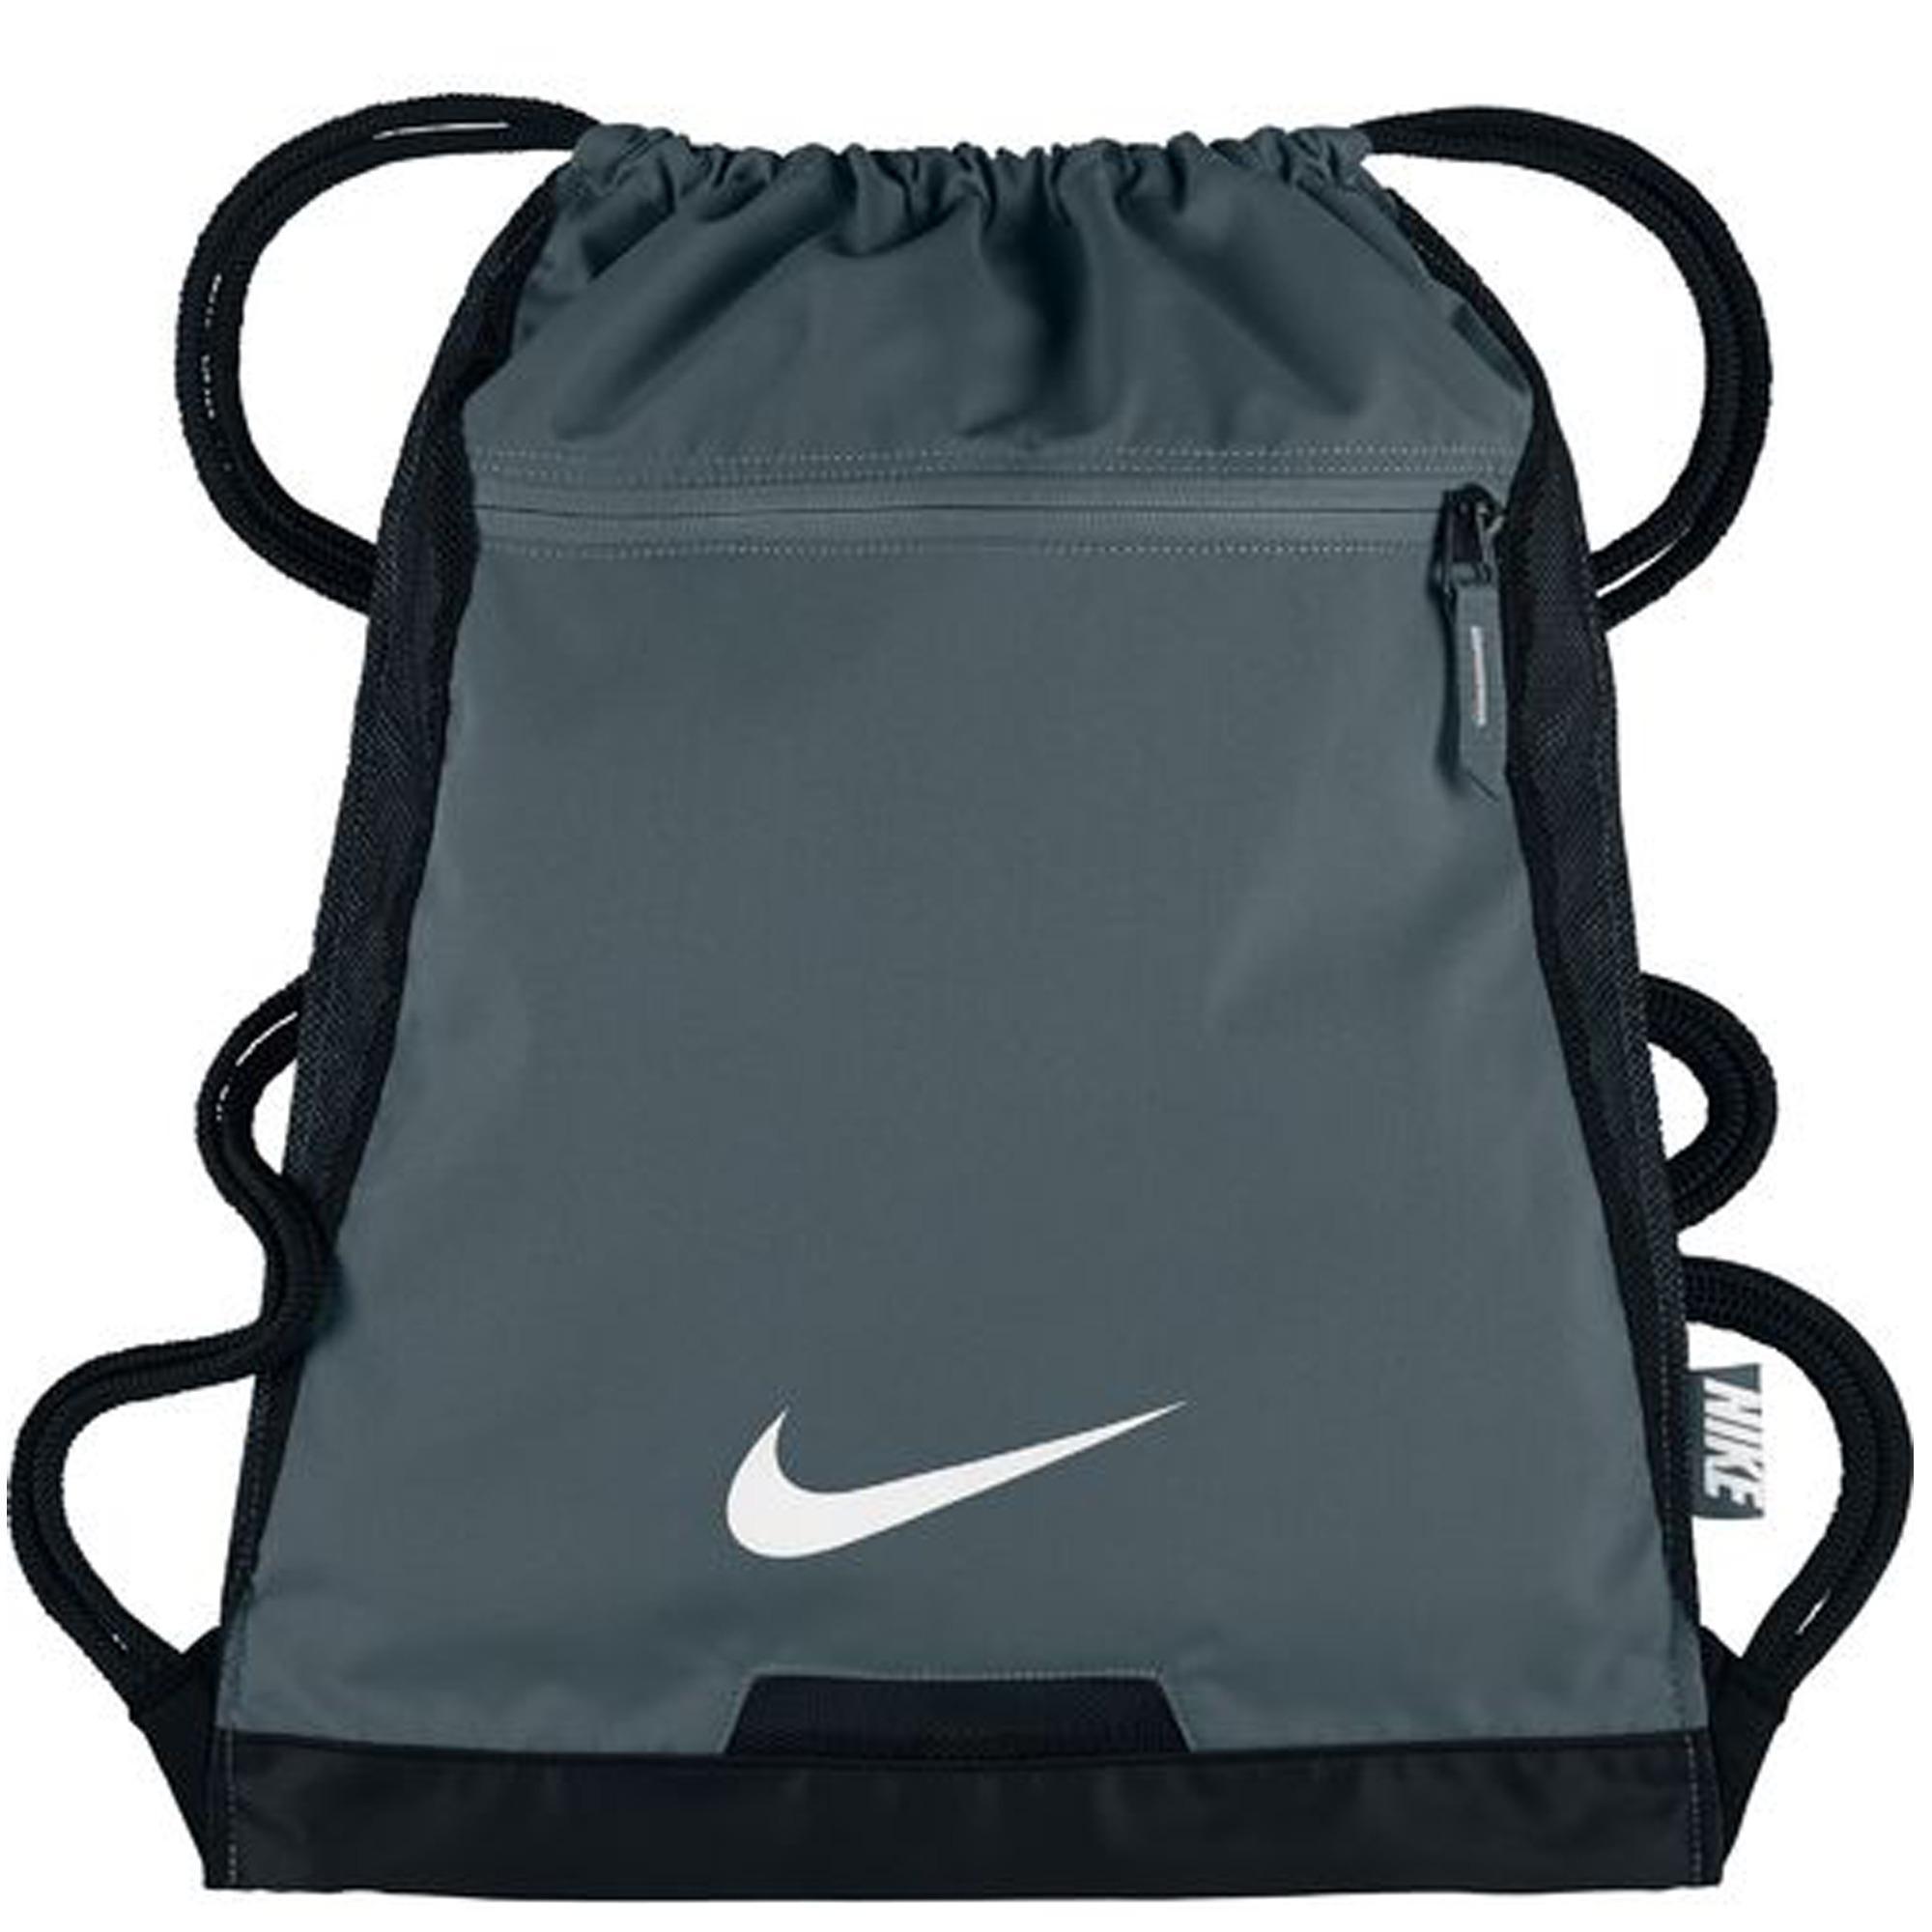 36530d27f4 Nike Drawstring Bag(Grey). Home  Nike Drawstring Backpack BA2735-001. image. AlternateText